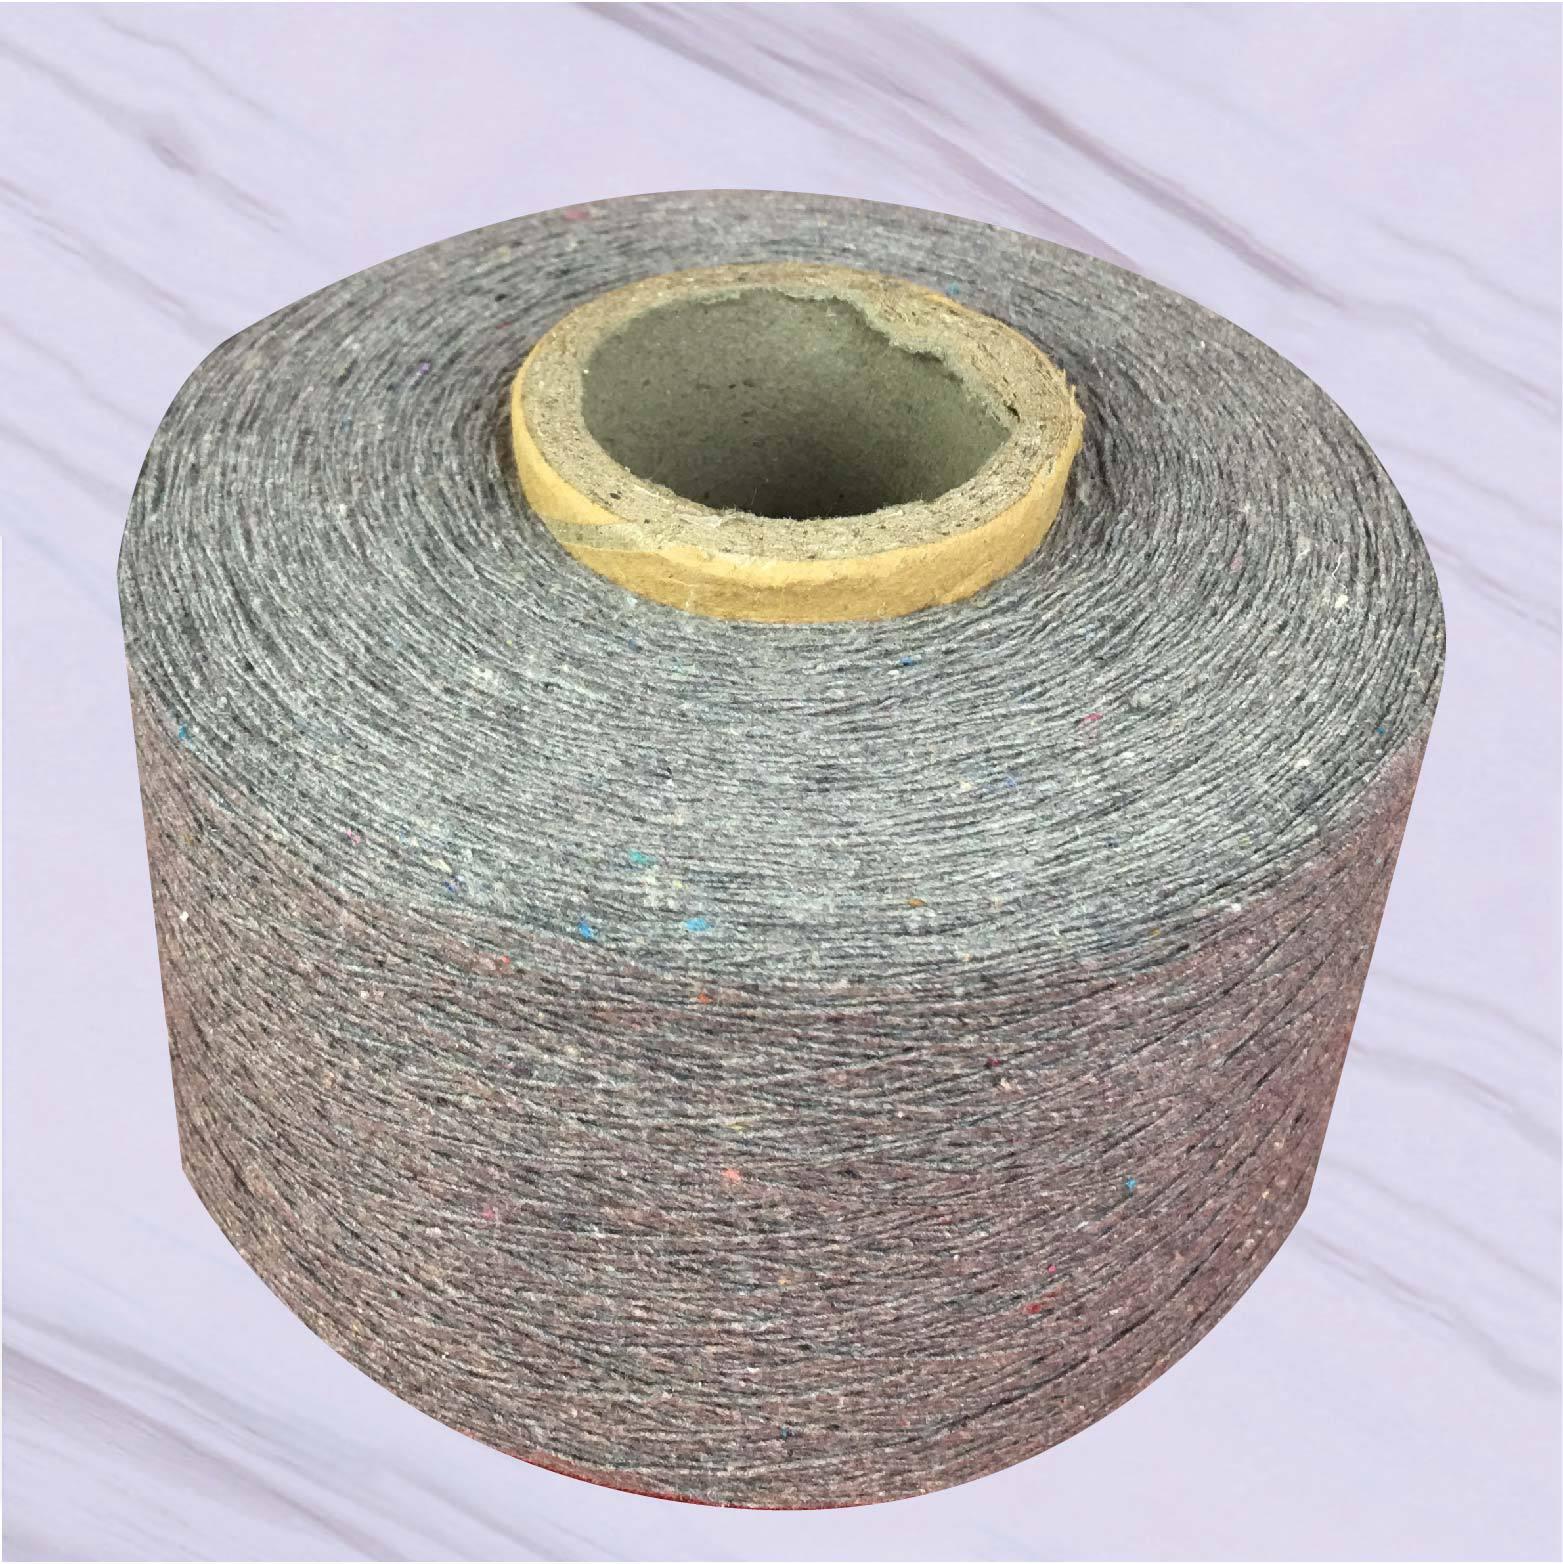 HUANSHENG Spot wholesale mop yarn gray 5-30 single-strand 10s cotton yarn executive cotton spinning